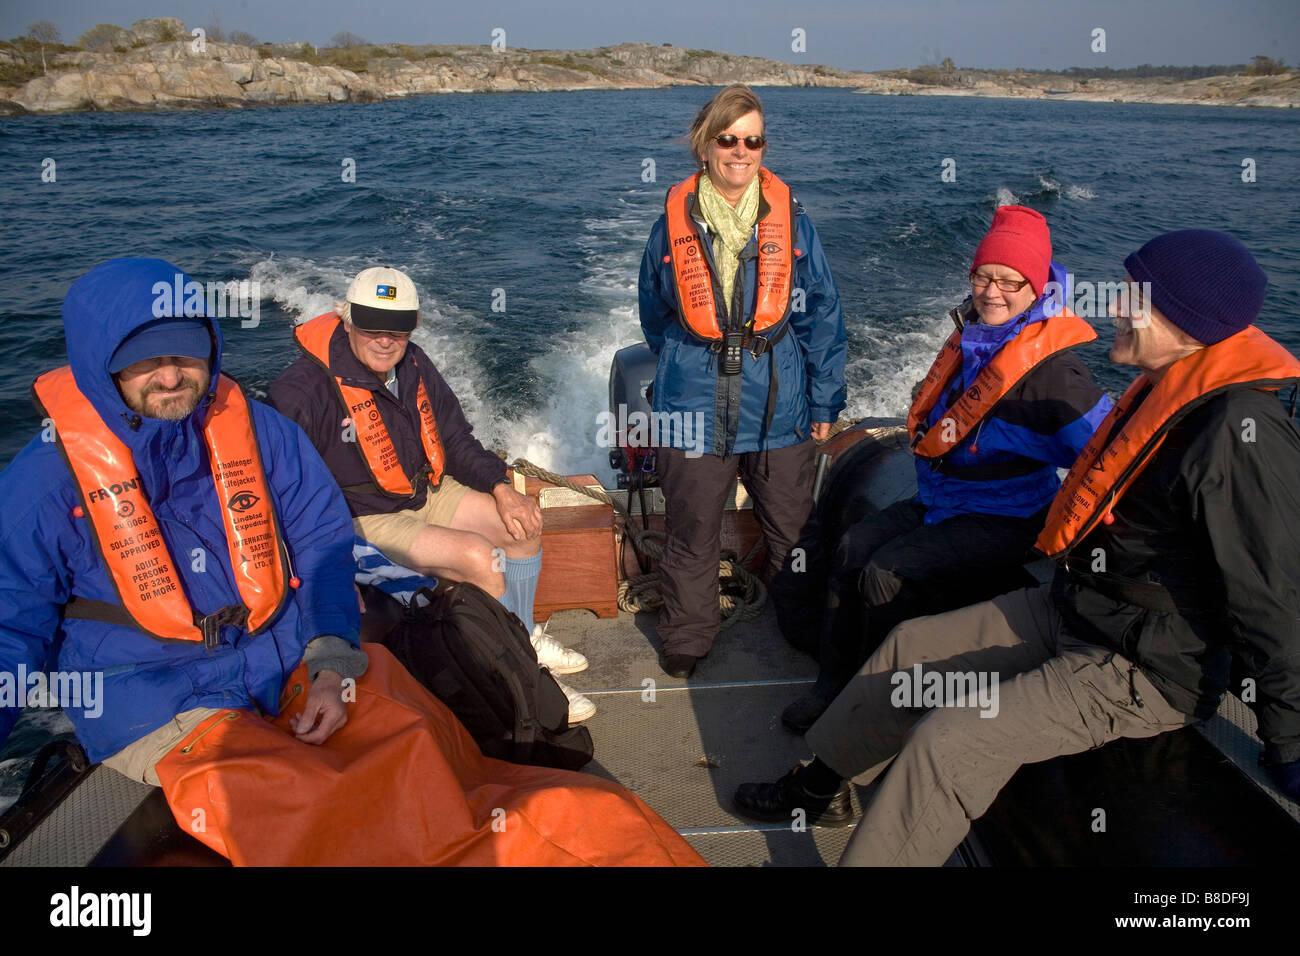 American tourists arriving in zodiac to Bullero island at Swedish Archipelago, Sweden Baltic sea - Stock Image